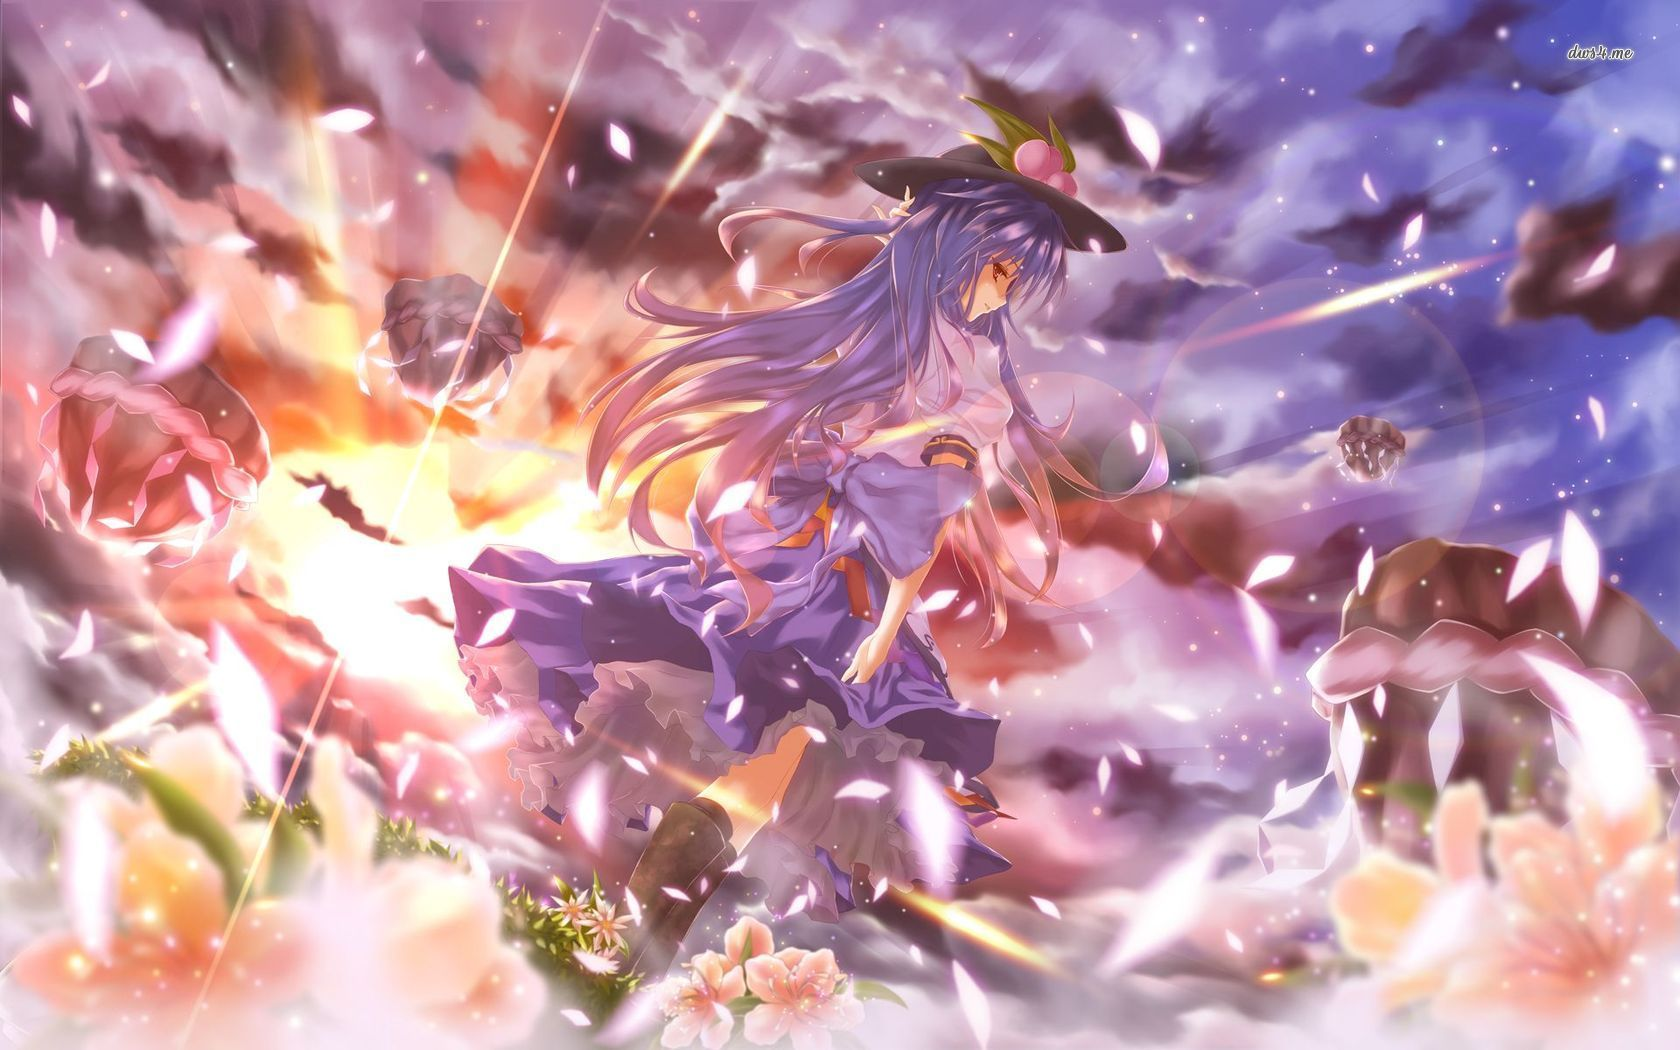 tenshi hinanawi touhou project anime wallpaper hd imashon com anime wallpaper wallpaper anime